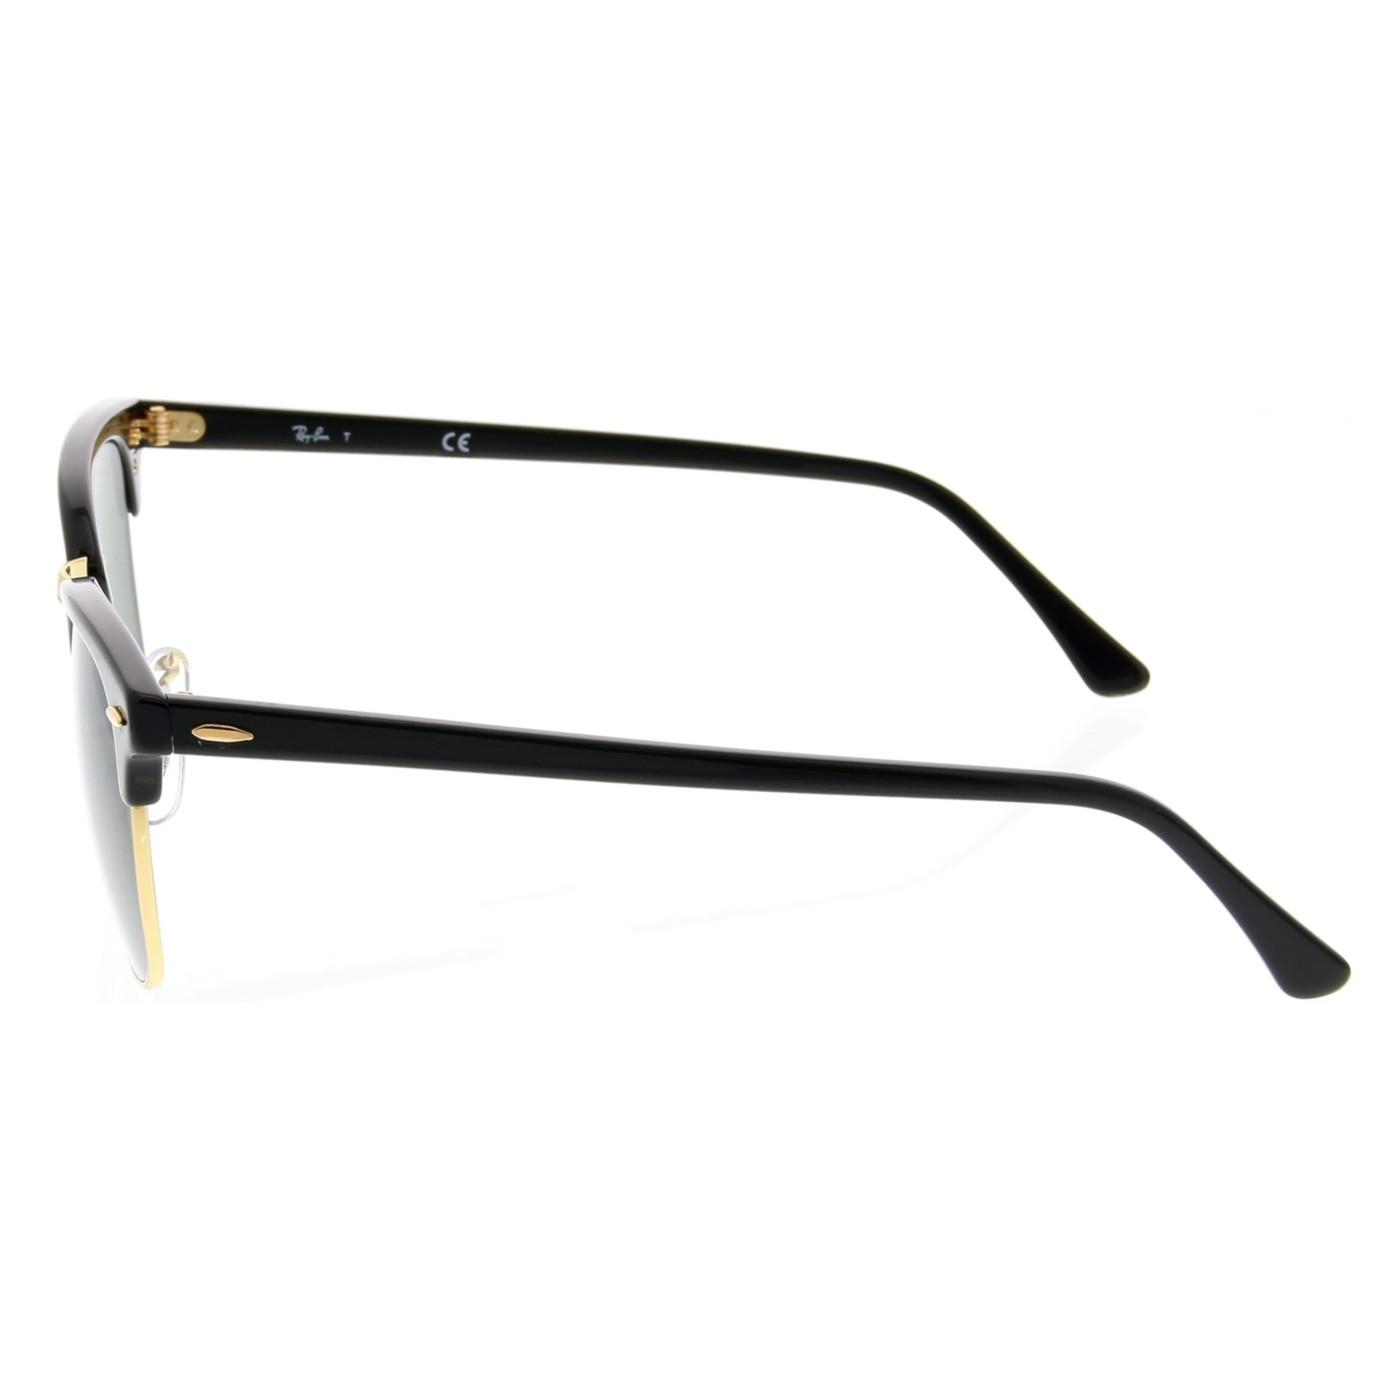 975a18f0ef Ray Ban Sunglasses Rb3016 W0365 51